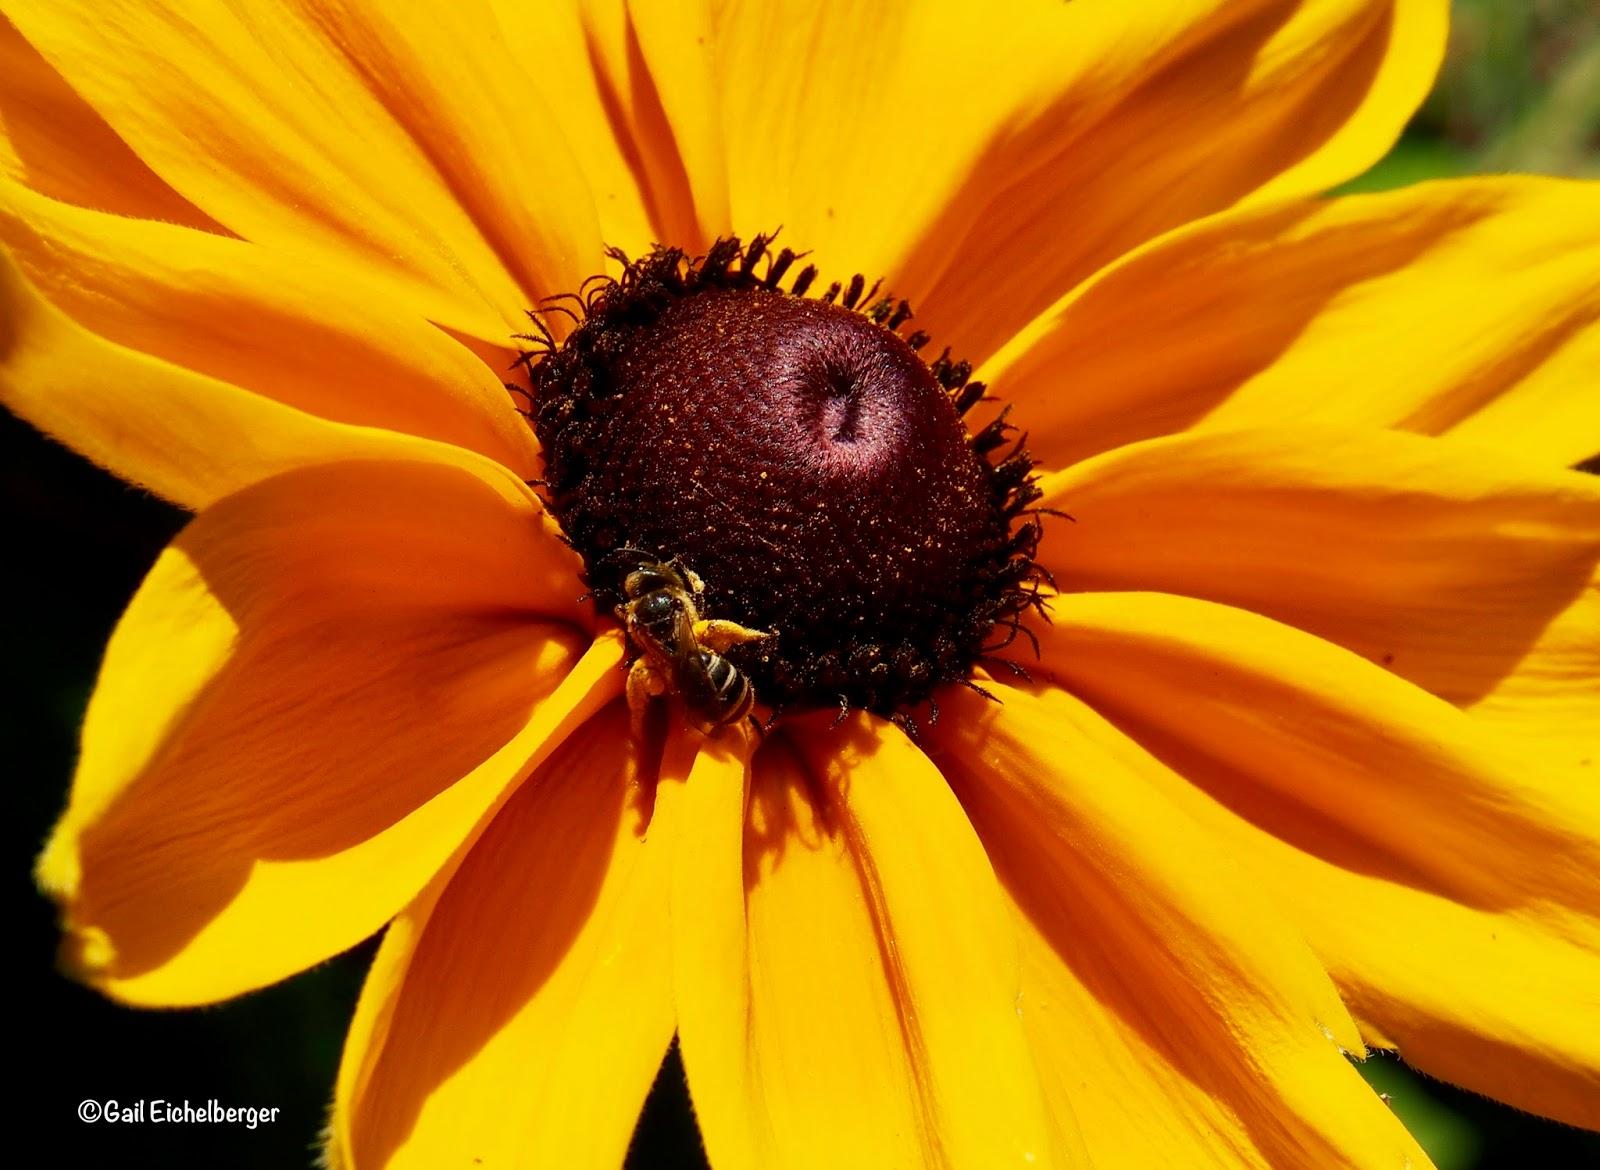 clay and limestone: Gloriosa Daisies for National Pollinator Week